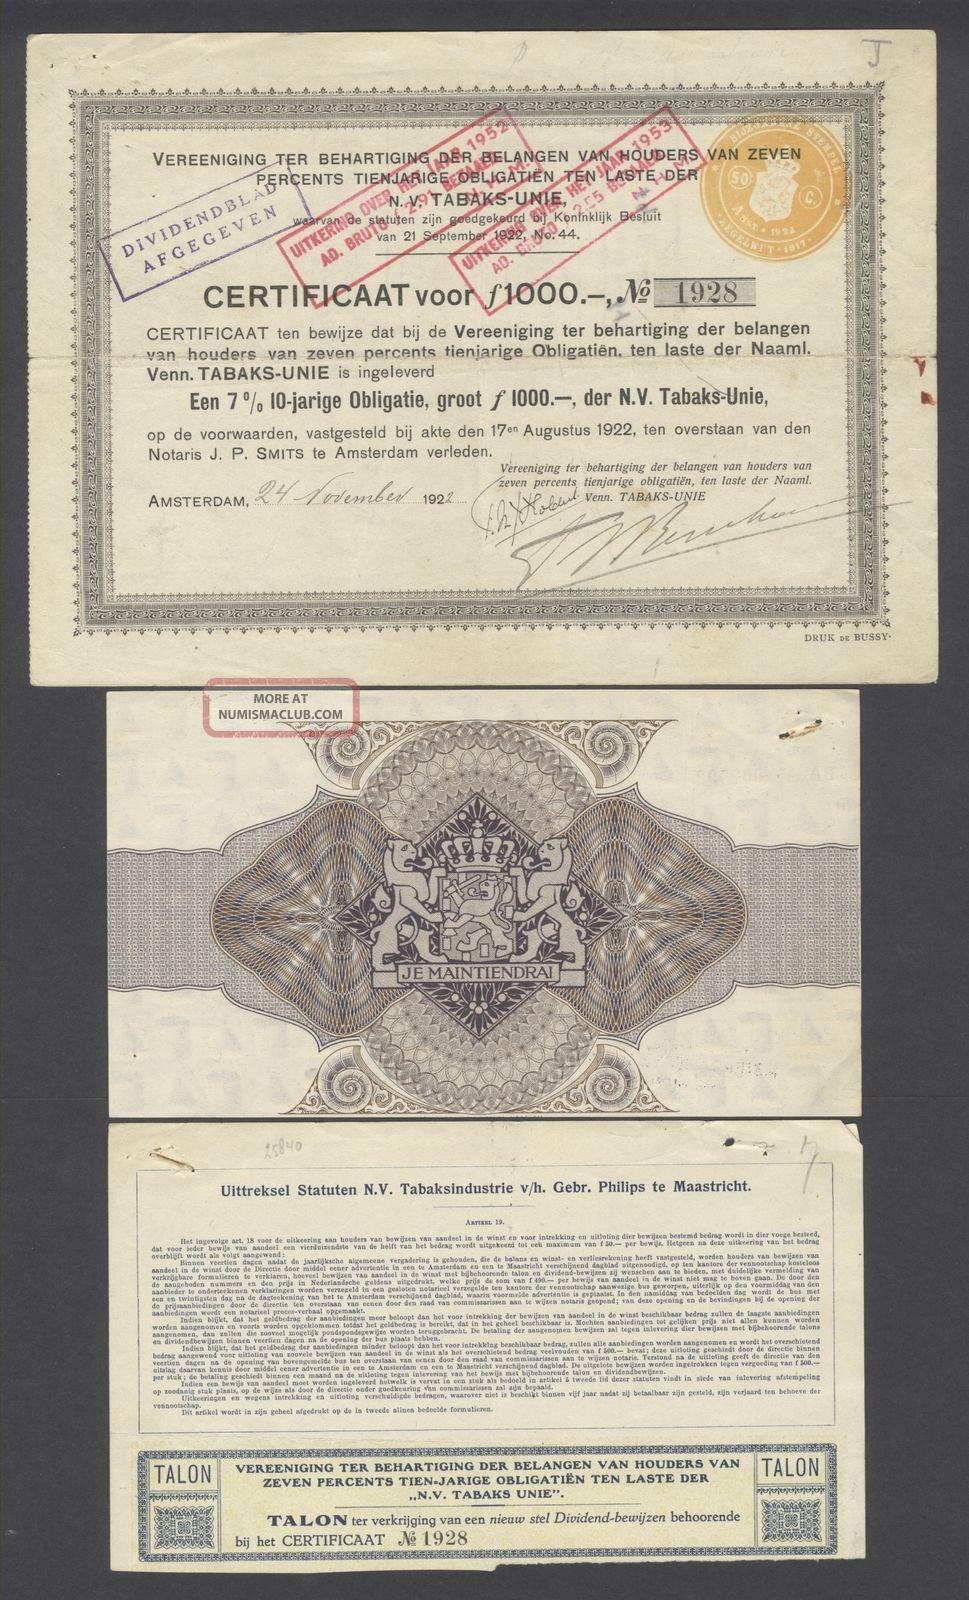 Netherlands 1922 Bond Certificate - Nv Tabaks Unie Amterdam - Tobacco.  B1536 World photo